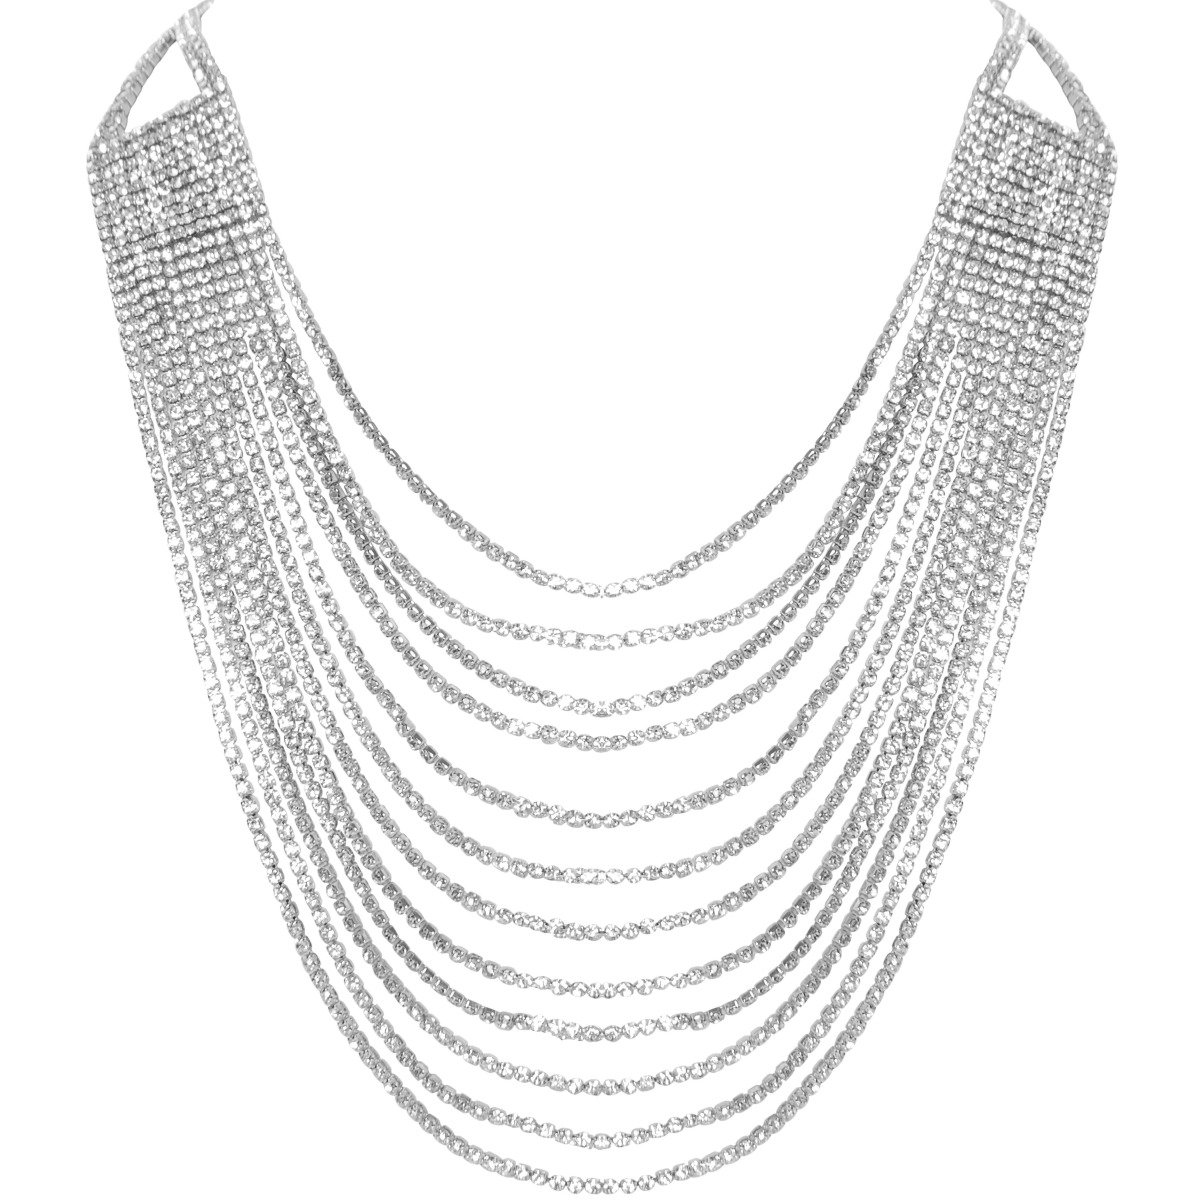 Humble Chic Darling Waterfall Bib Necklace Multi-Strand Chain CZ Simulated Diamond Collar, Silver-Tone